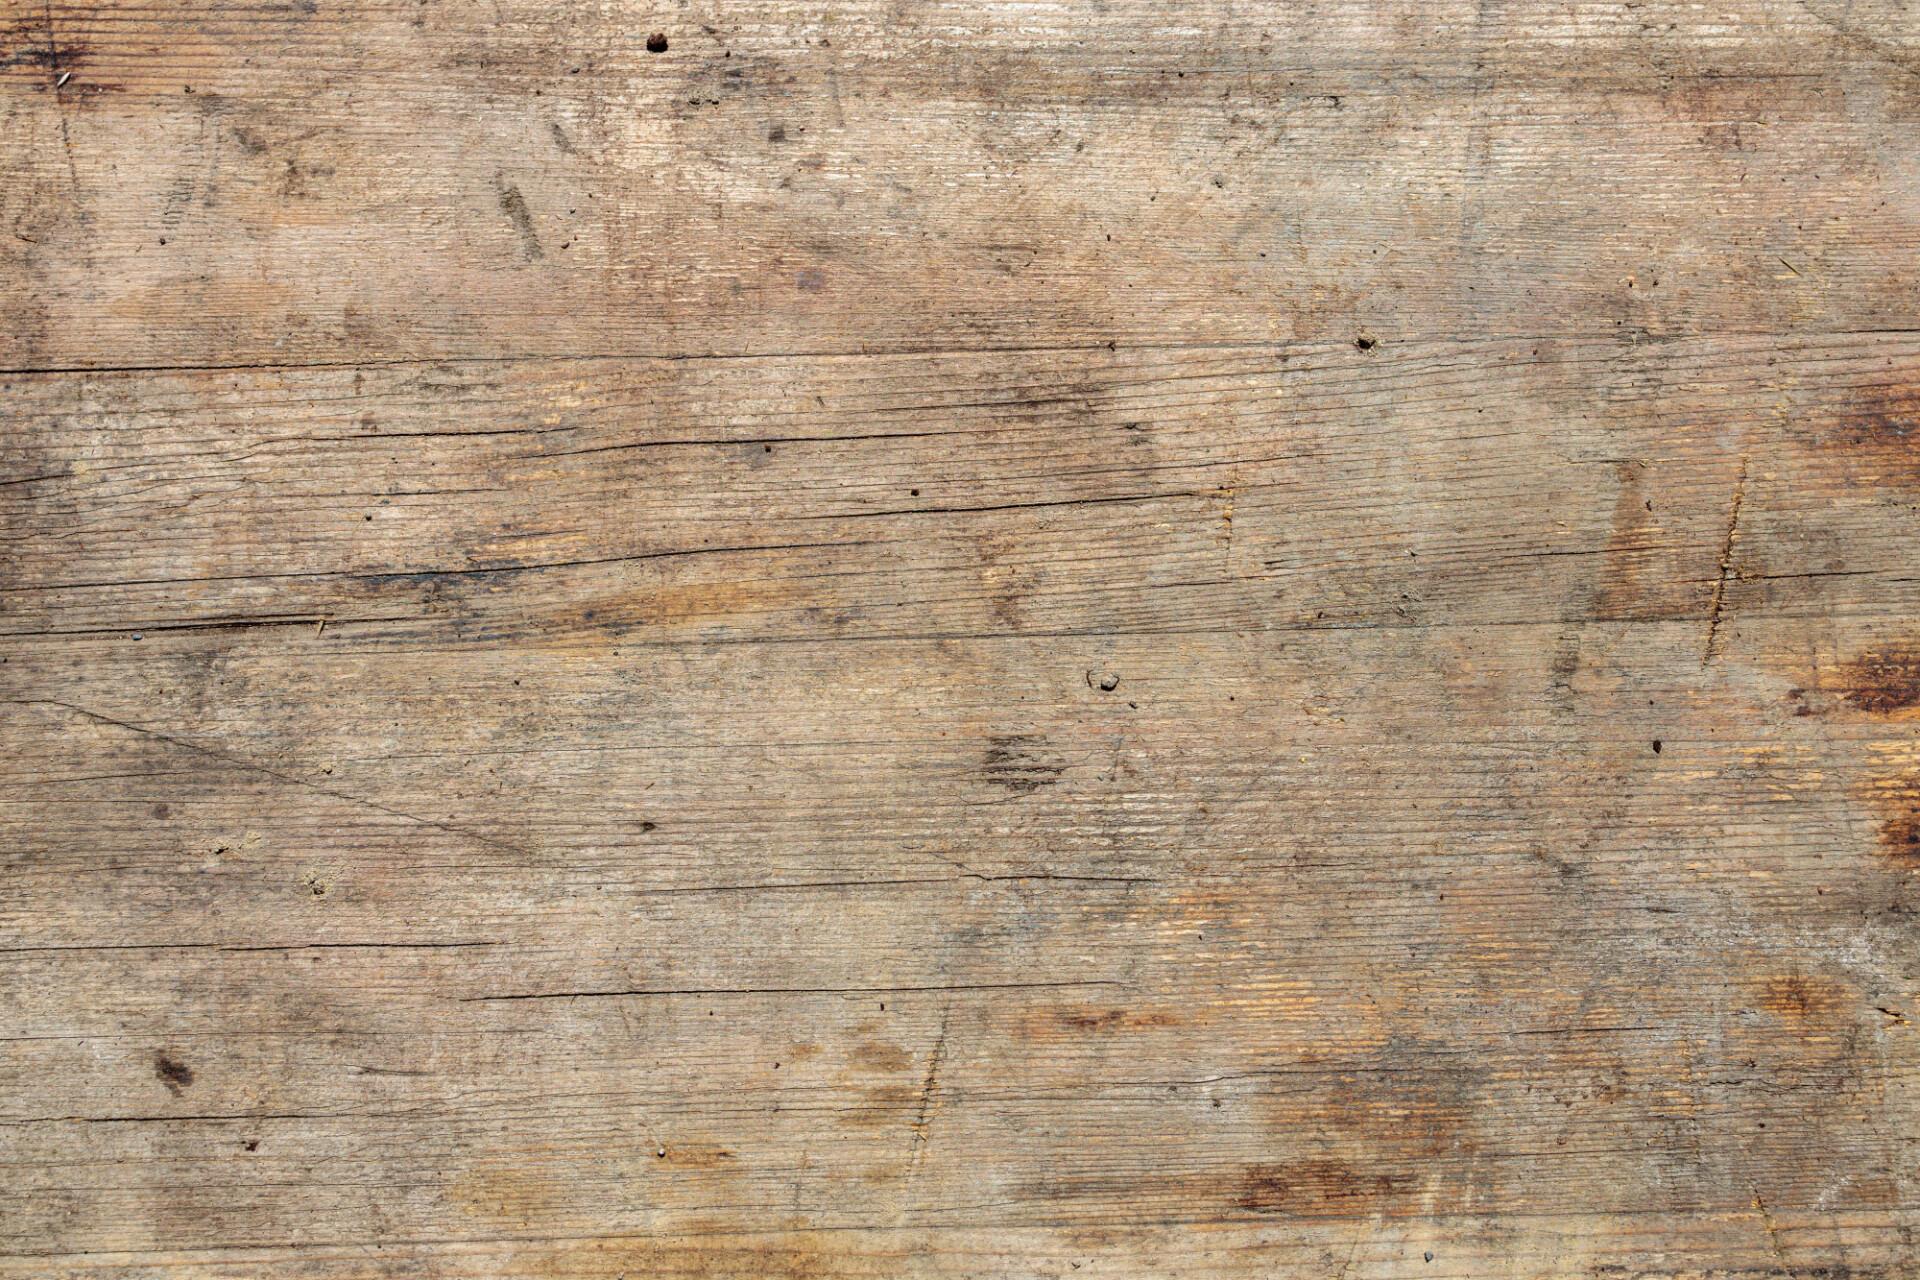 Wooden work surface Texture Background